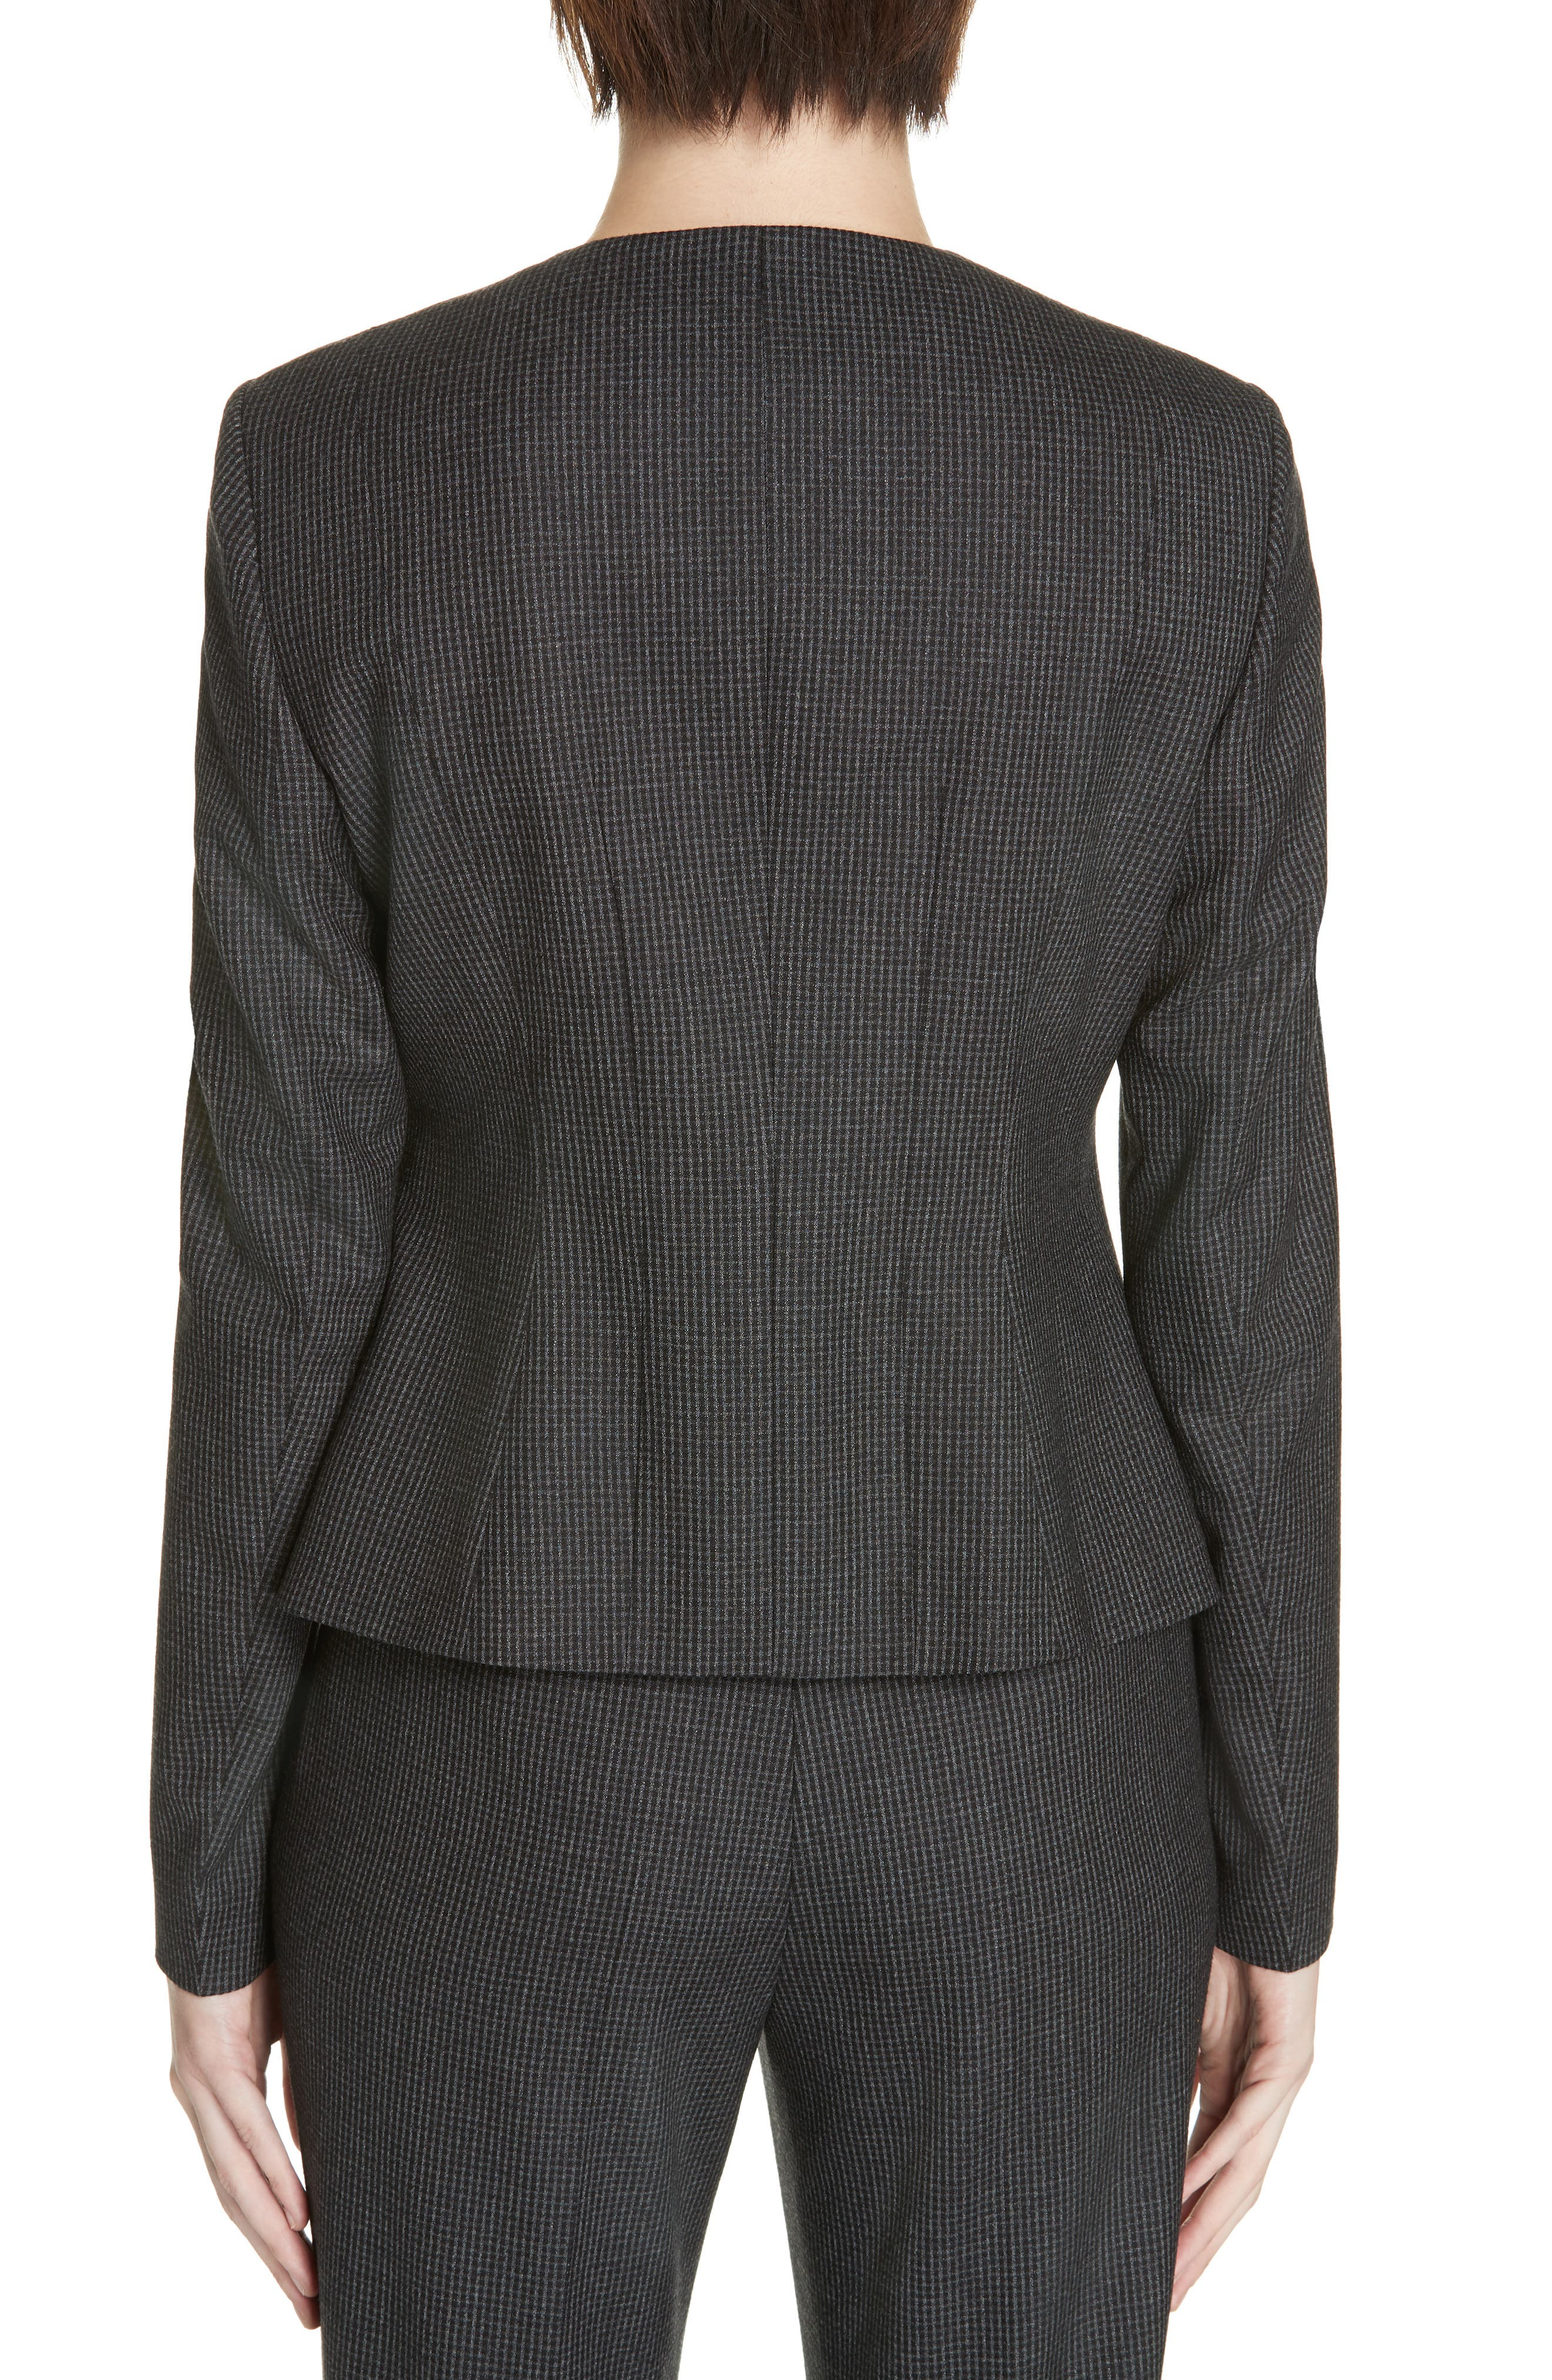 Javilla Wool Suit Jacket,                             Alternate thumbnail 2, color,                             CHARCOAL FANTASY